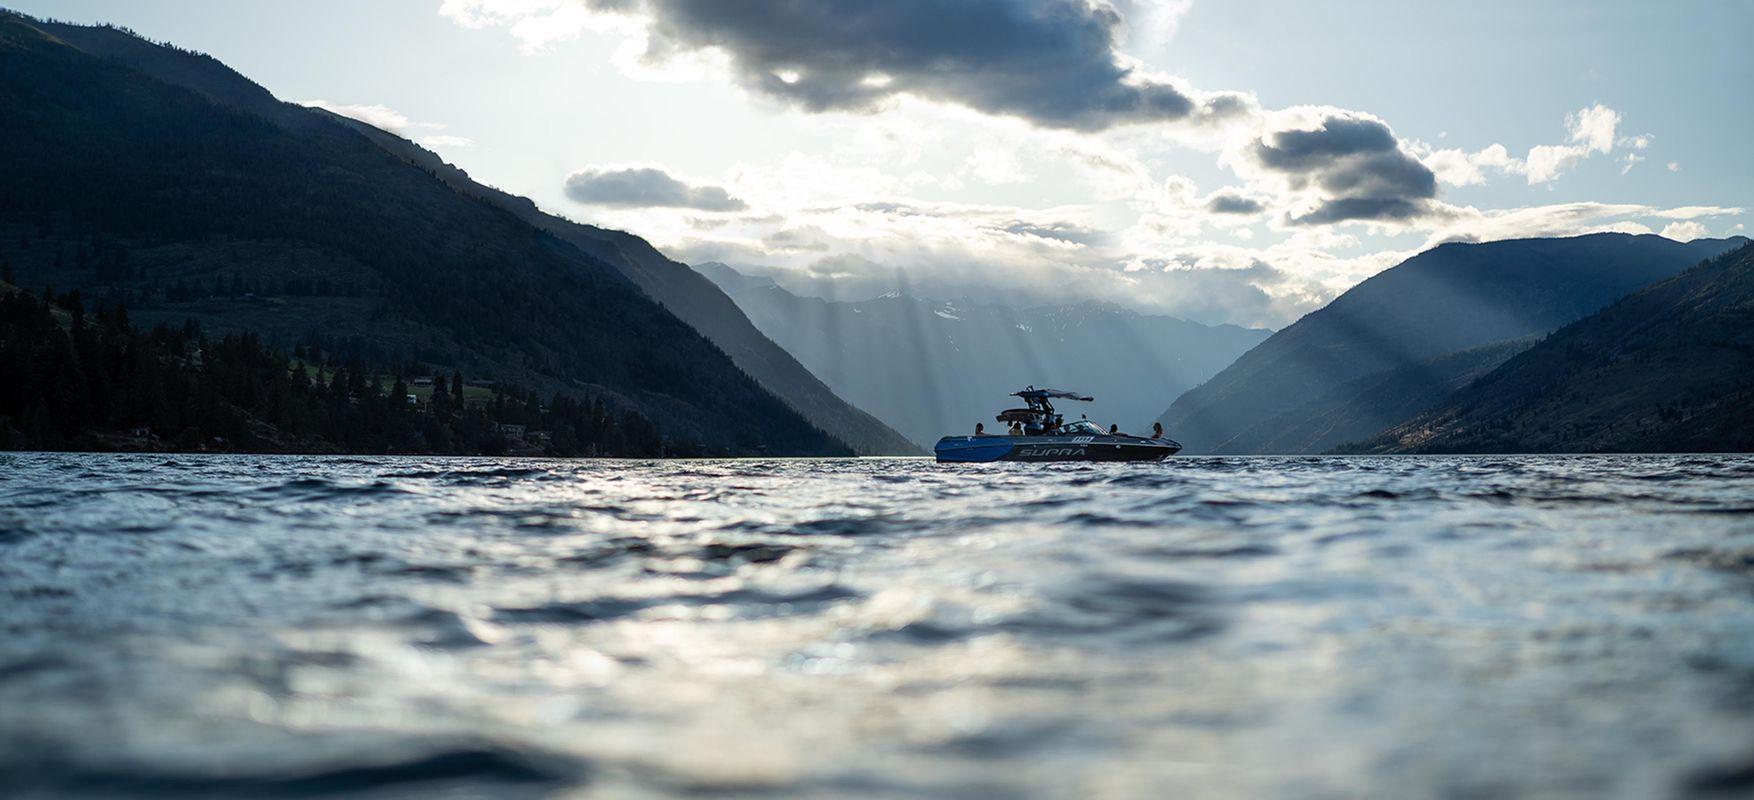 Supra Boats Washington Mountains